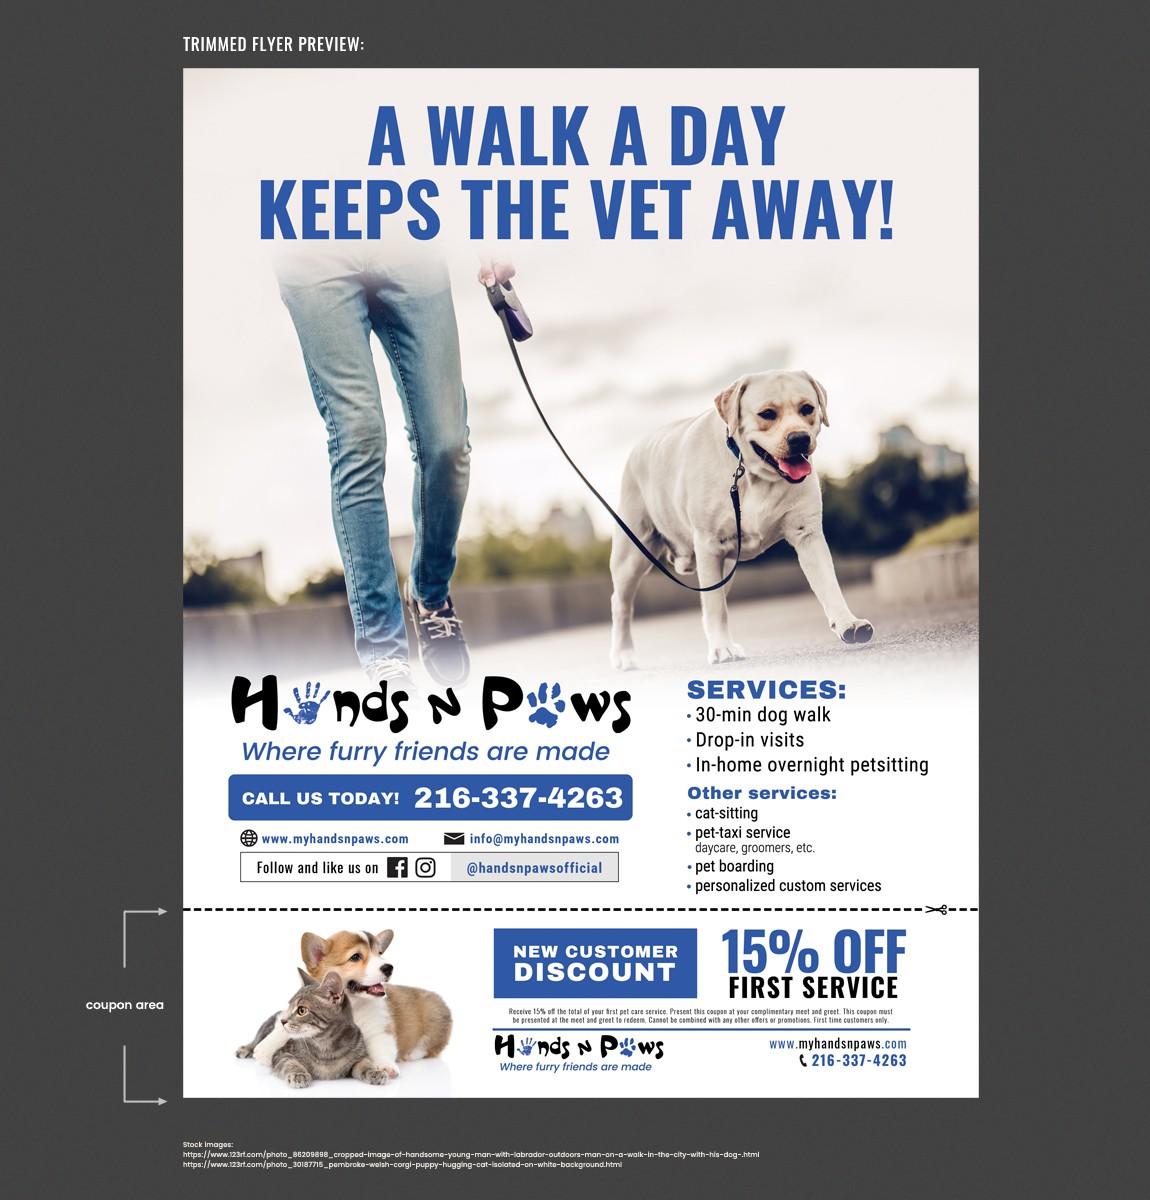 Flyer for a dog-walking/ petsitting company